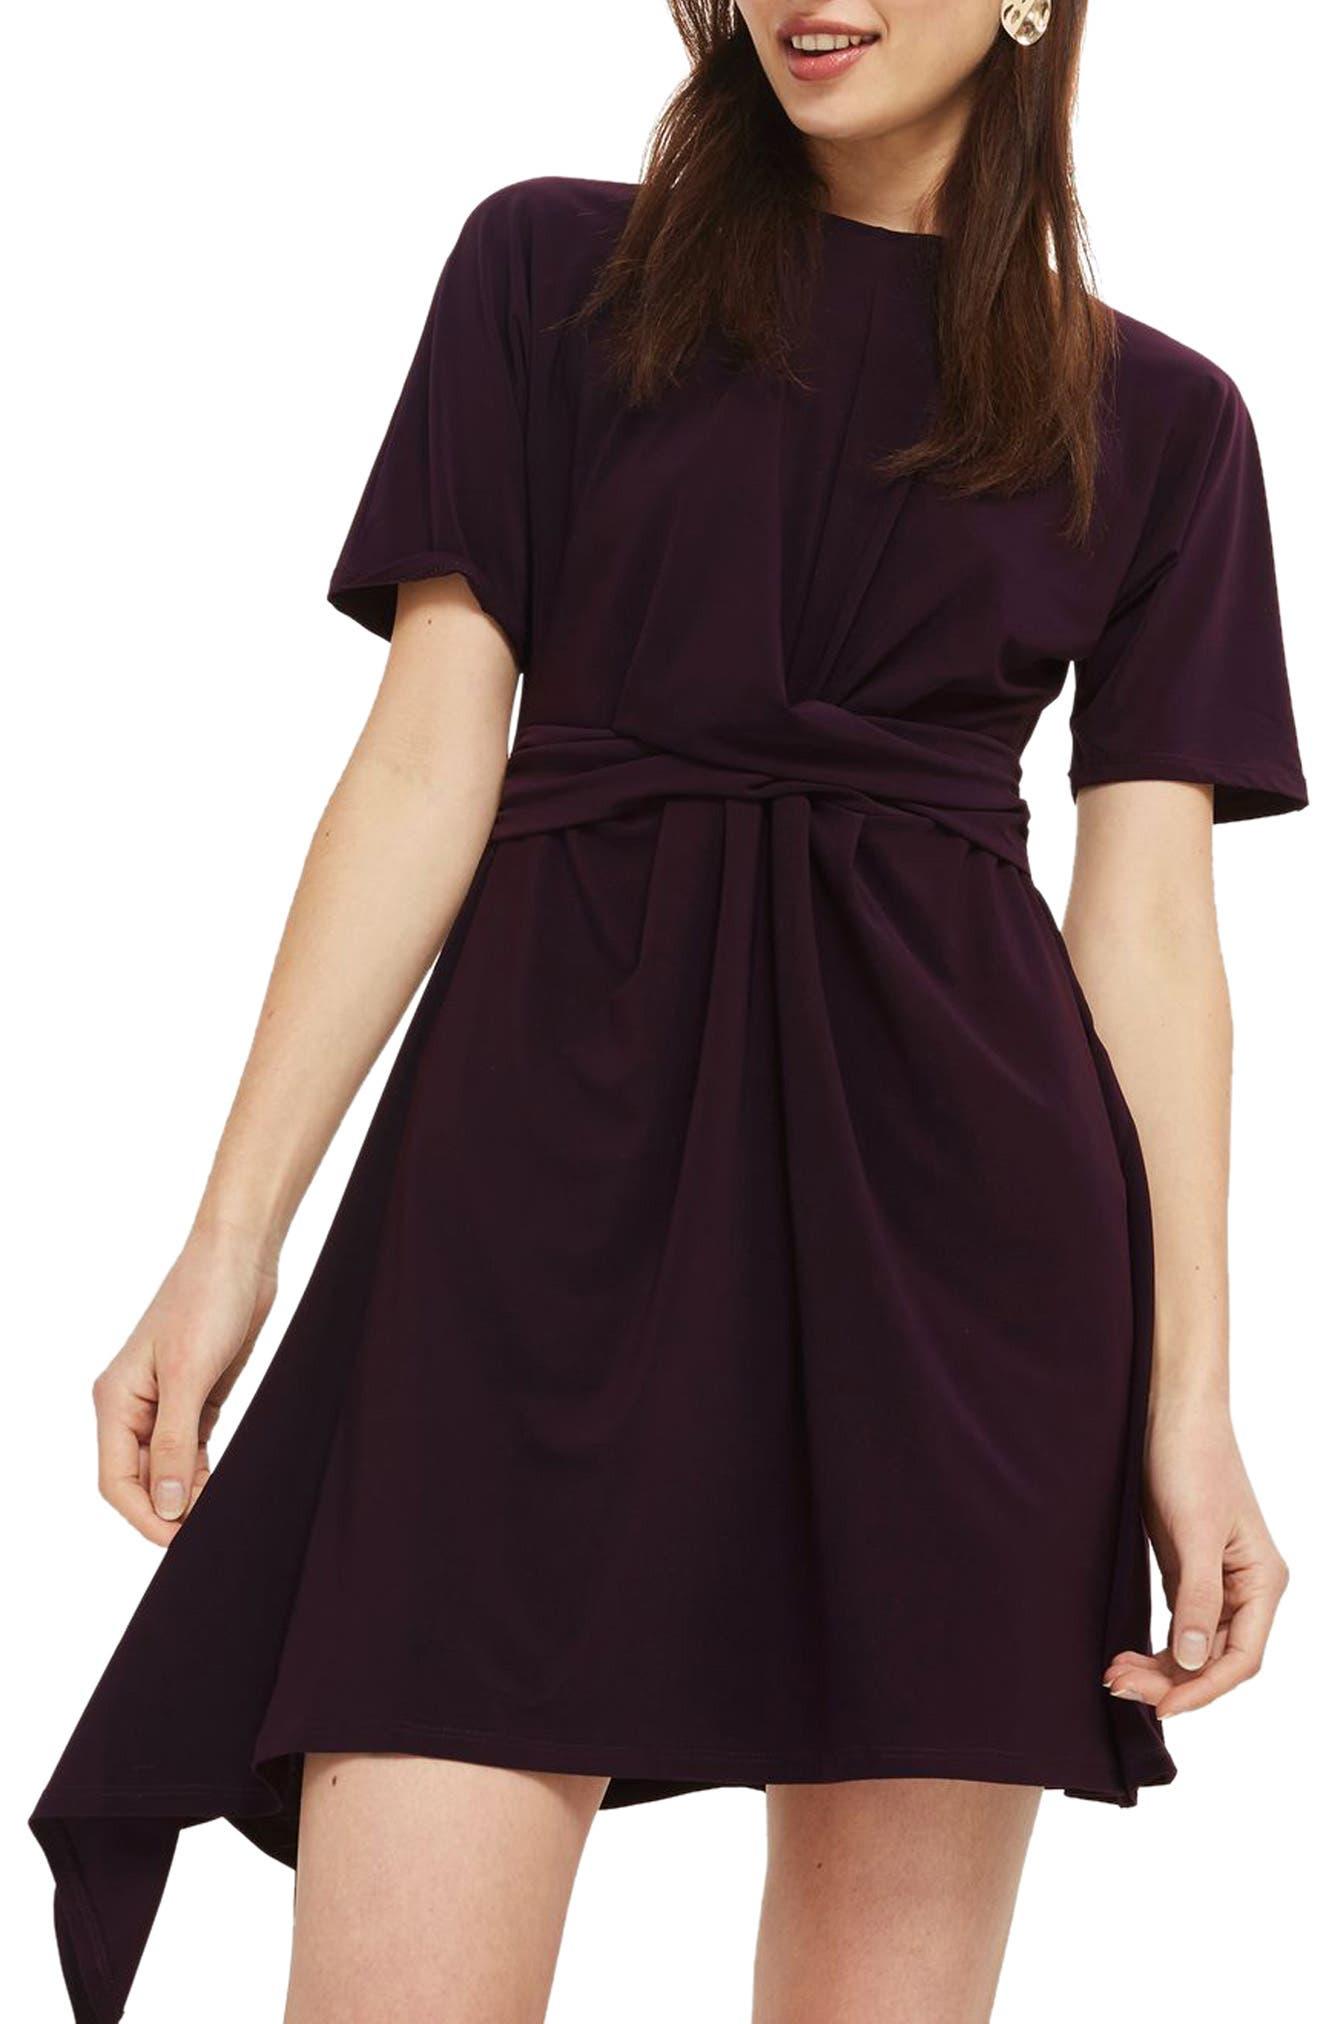 Gathered Asymmetrical Skater Dress,                             Main thumbnail 1, color,                             930